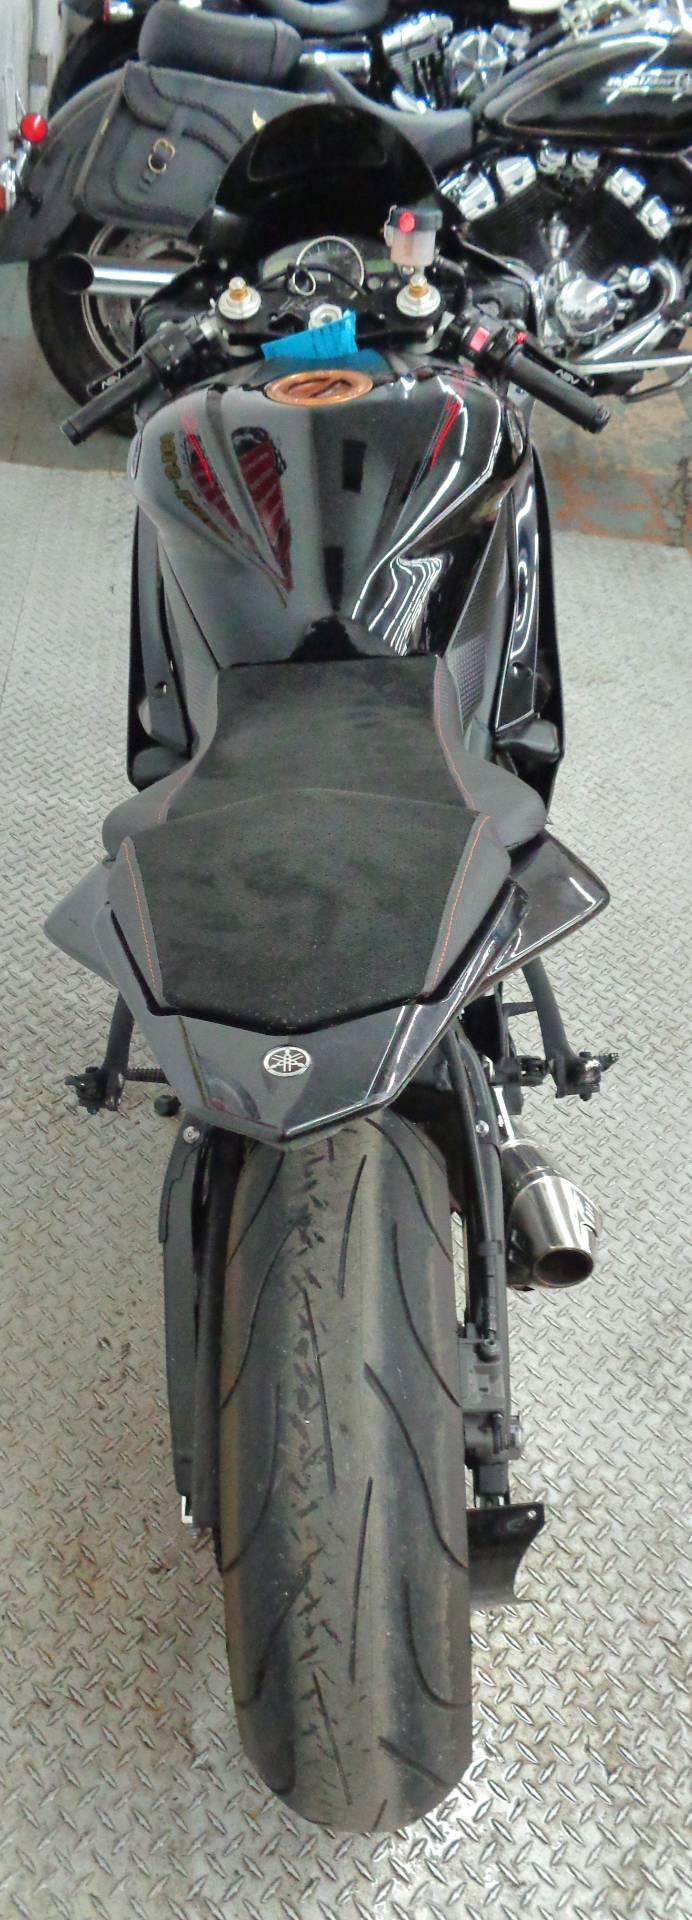 2006 Yamaha YZFR6 5